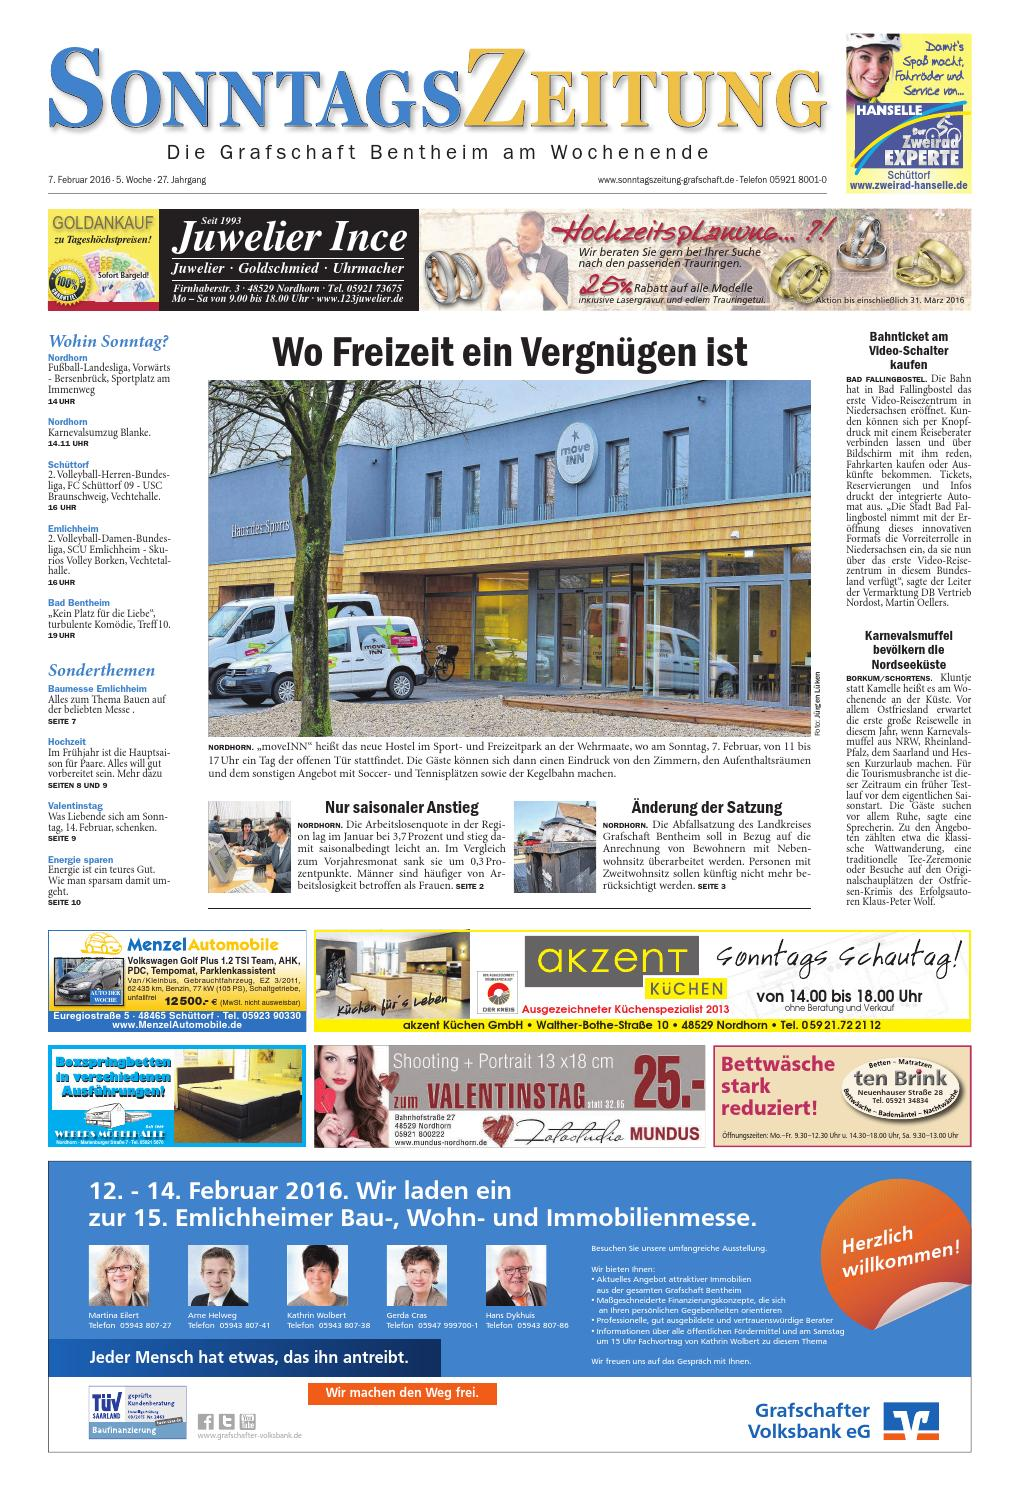 Sonntagszeitung_8.2.2016 by SonntagsZeitung - issuu